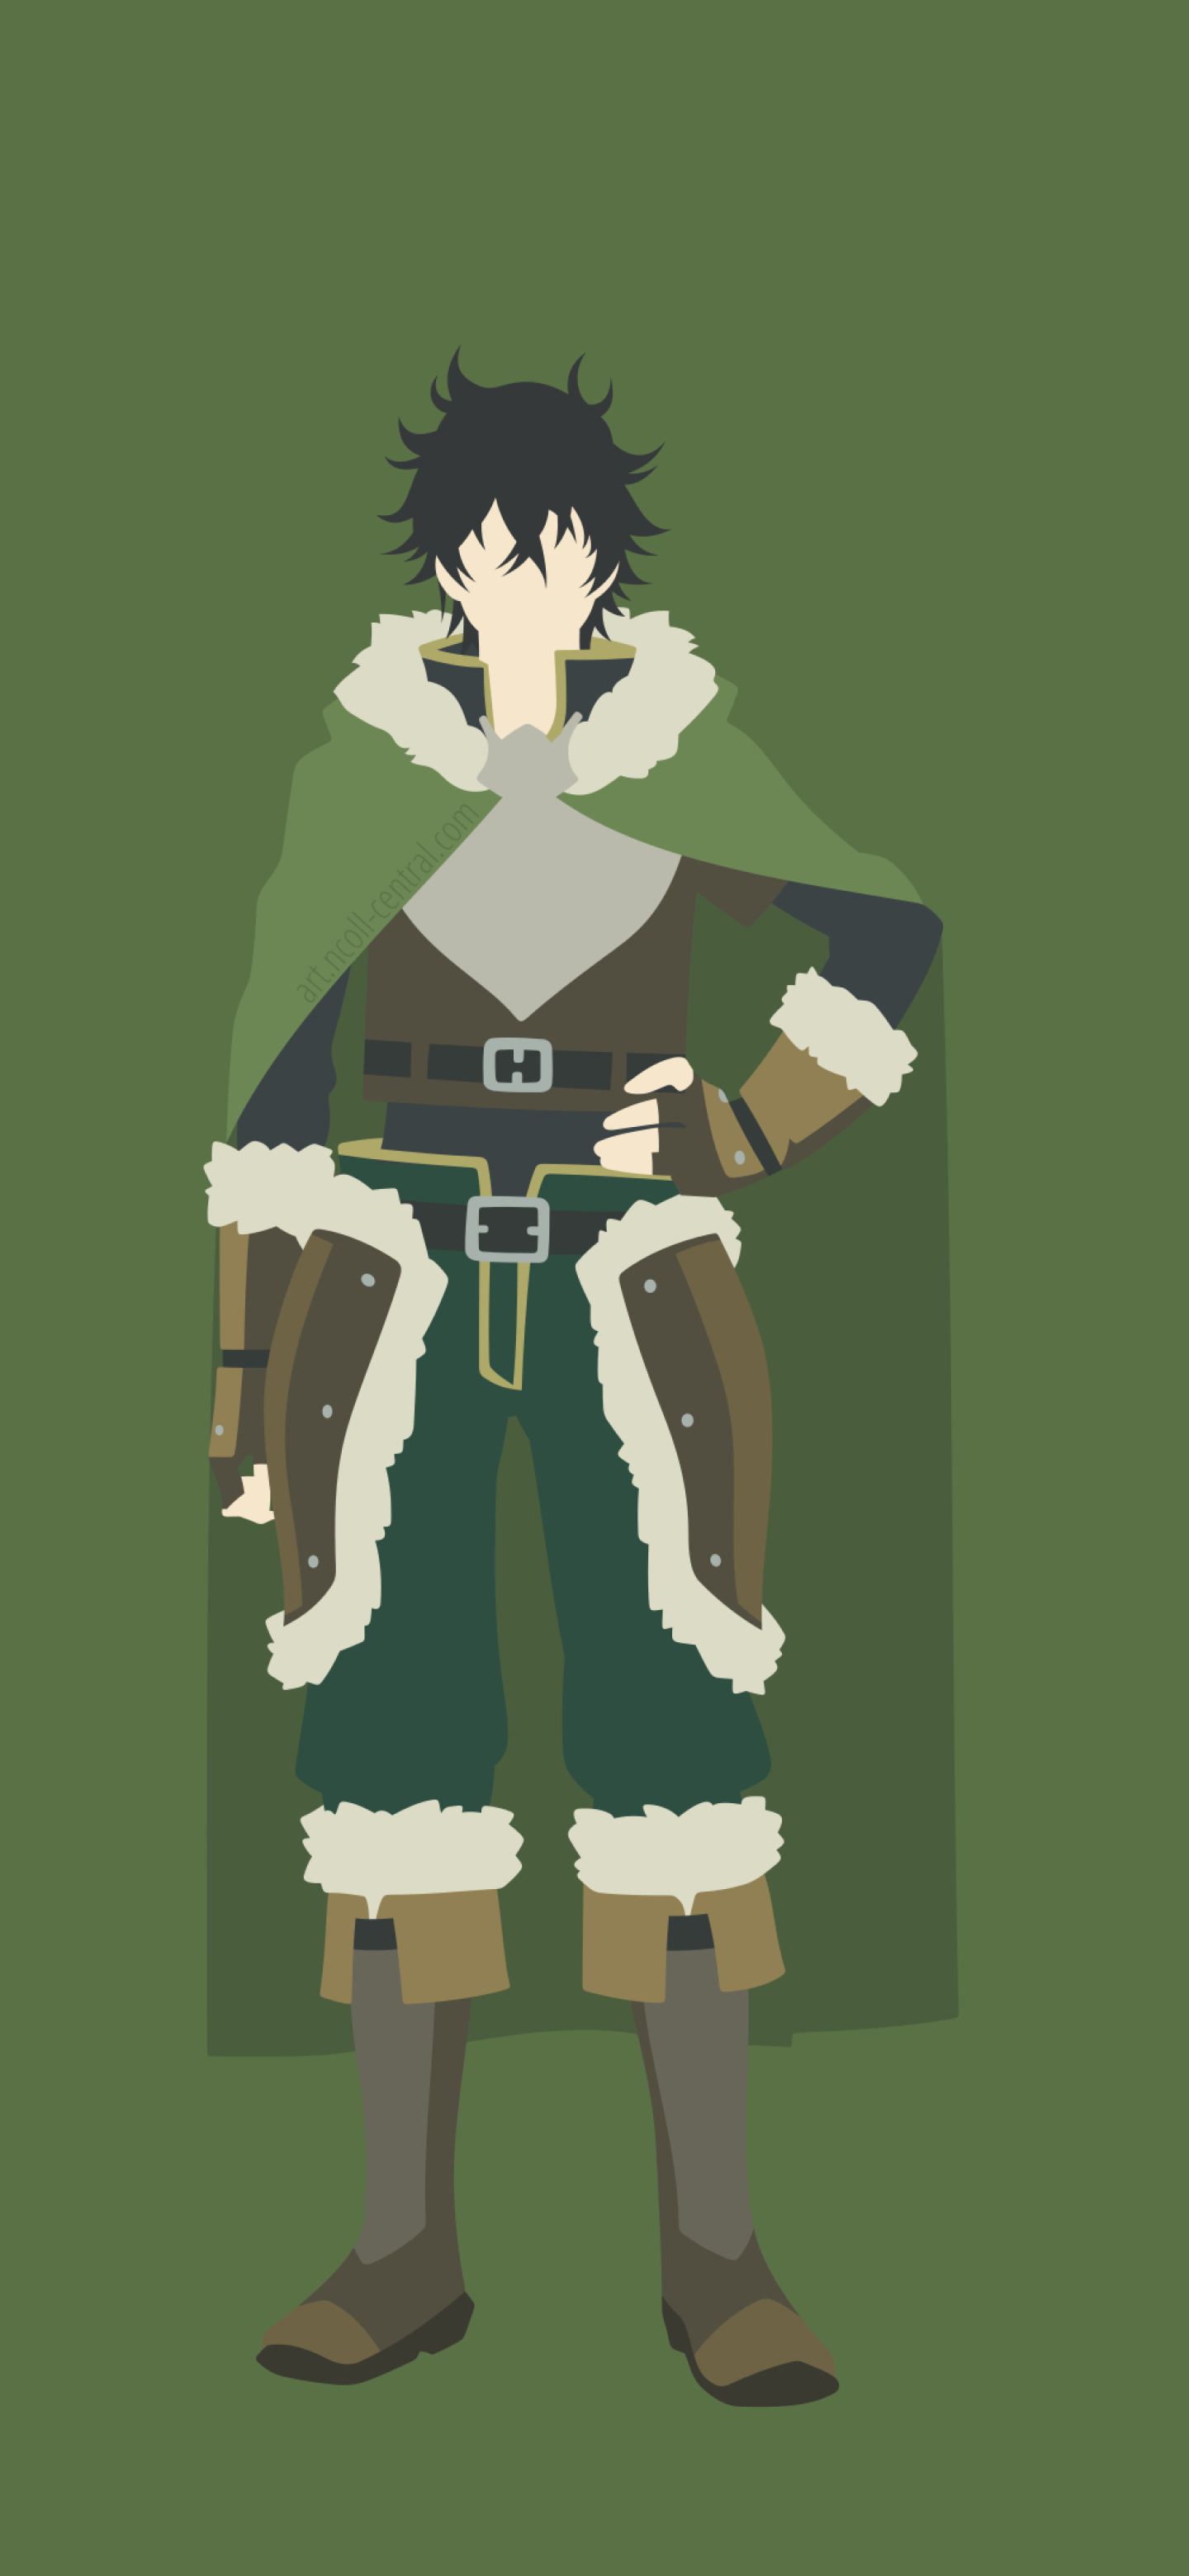 1440x3120 Naofumi Iwatani From The Rising Of The Shield Hero